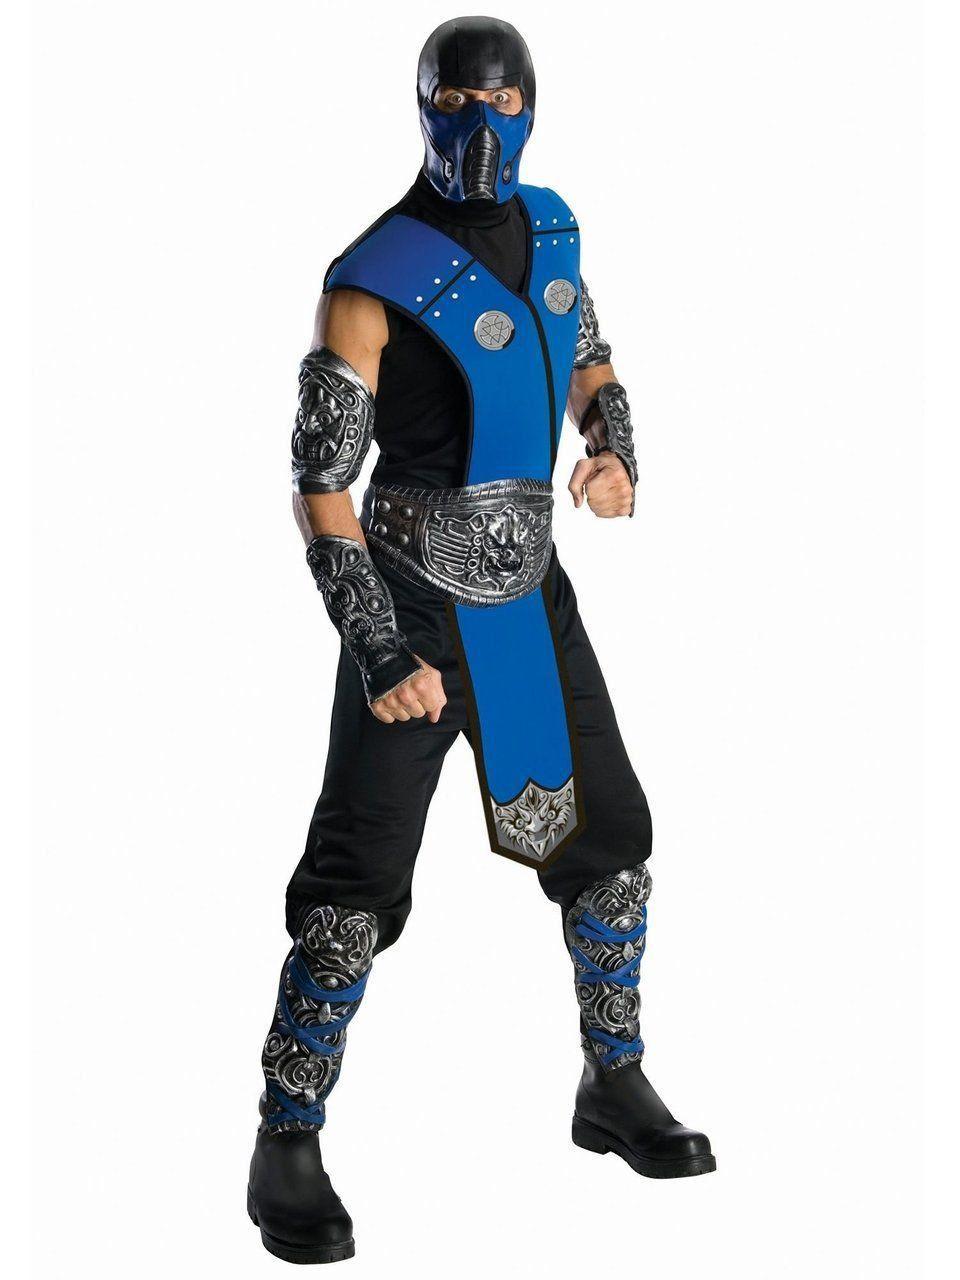 Fantasia Adulto Masculina Sub-Zero: Mortal Kombat (Apenas Venda Online)